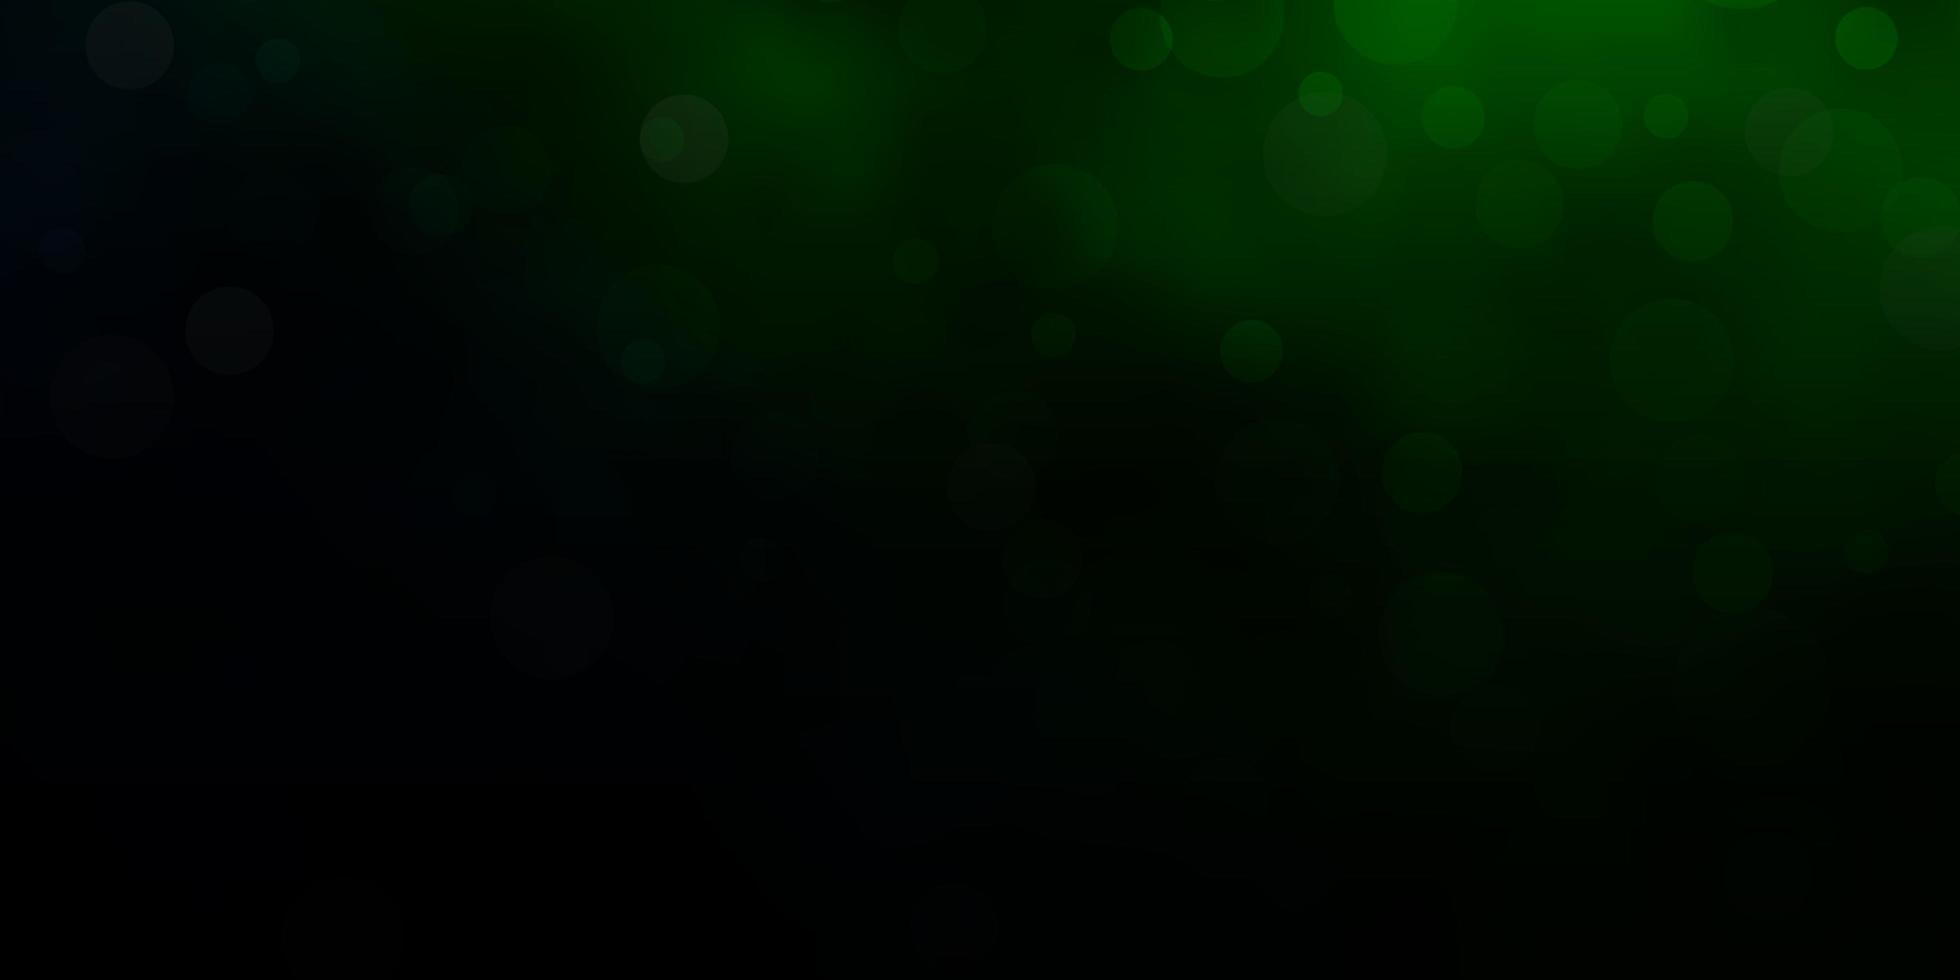 fundo vector verde escuro com manchas.